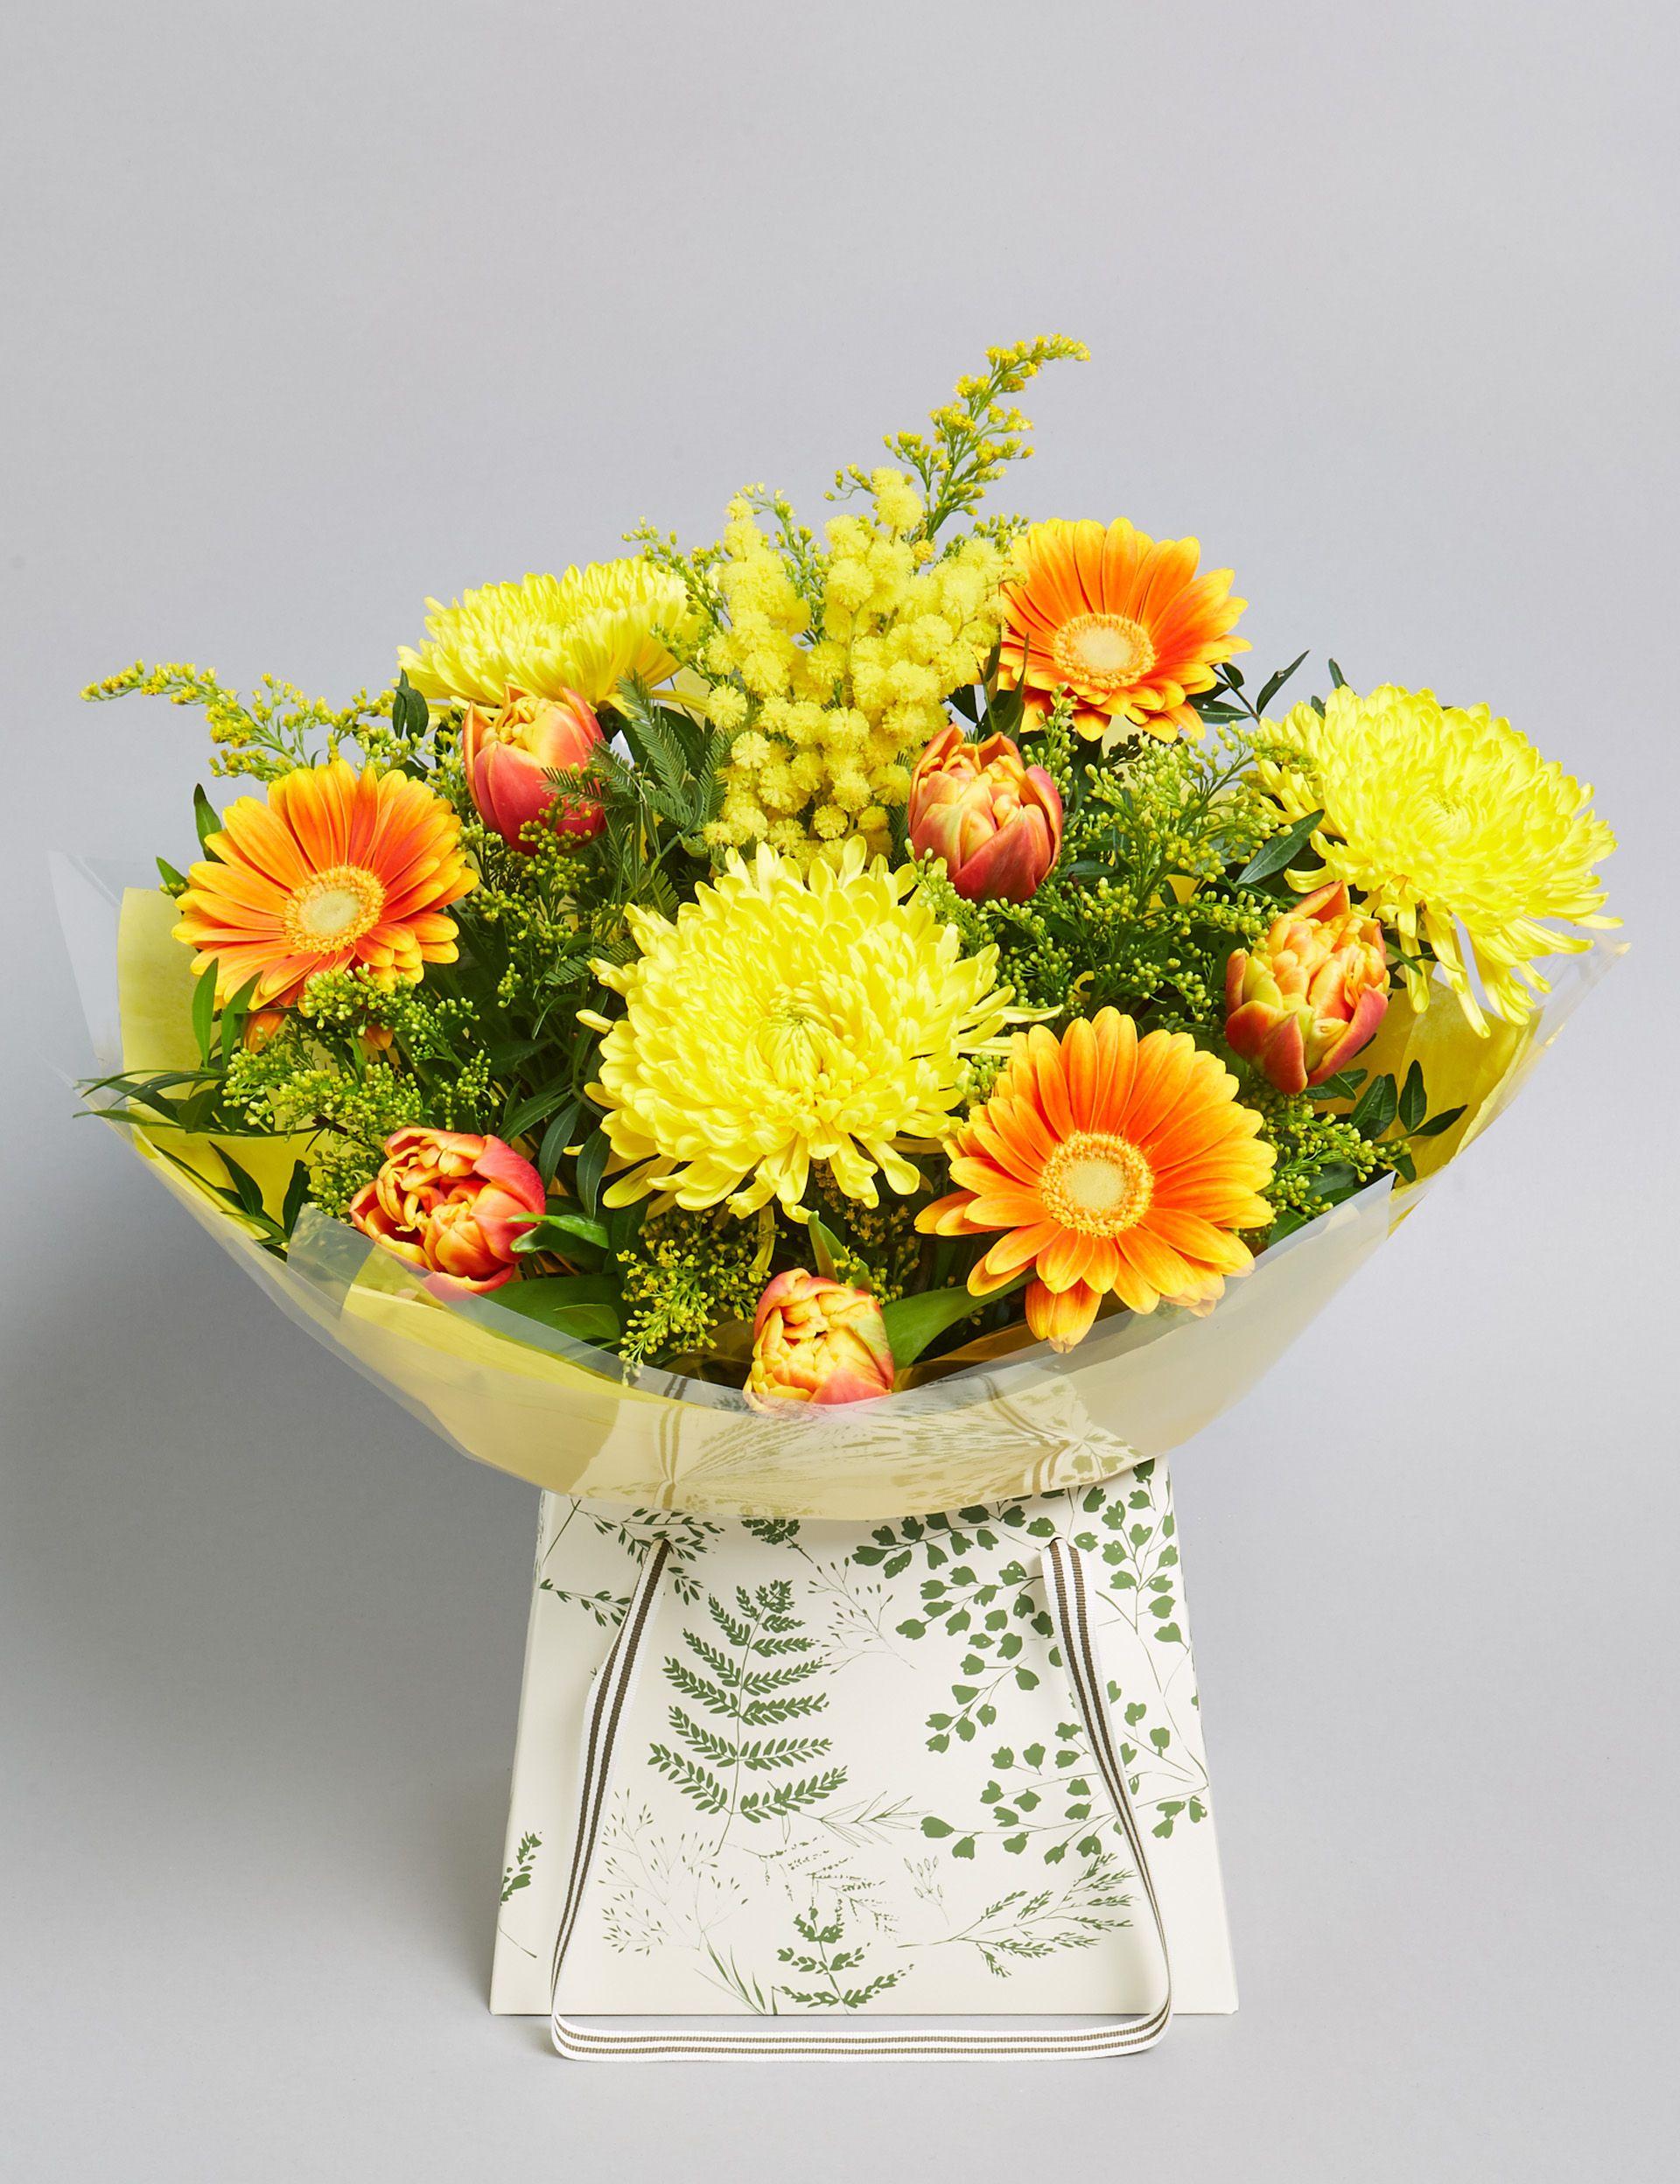 International Women's Day Flower Bouquet